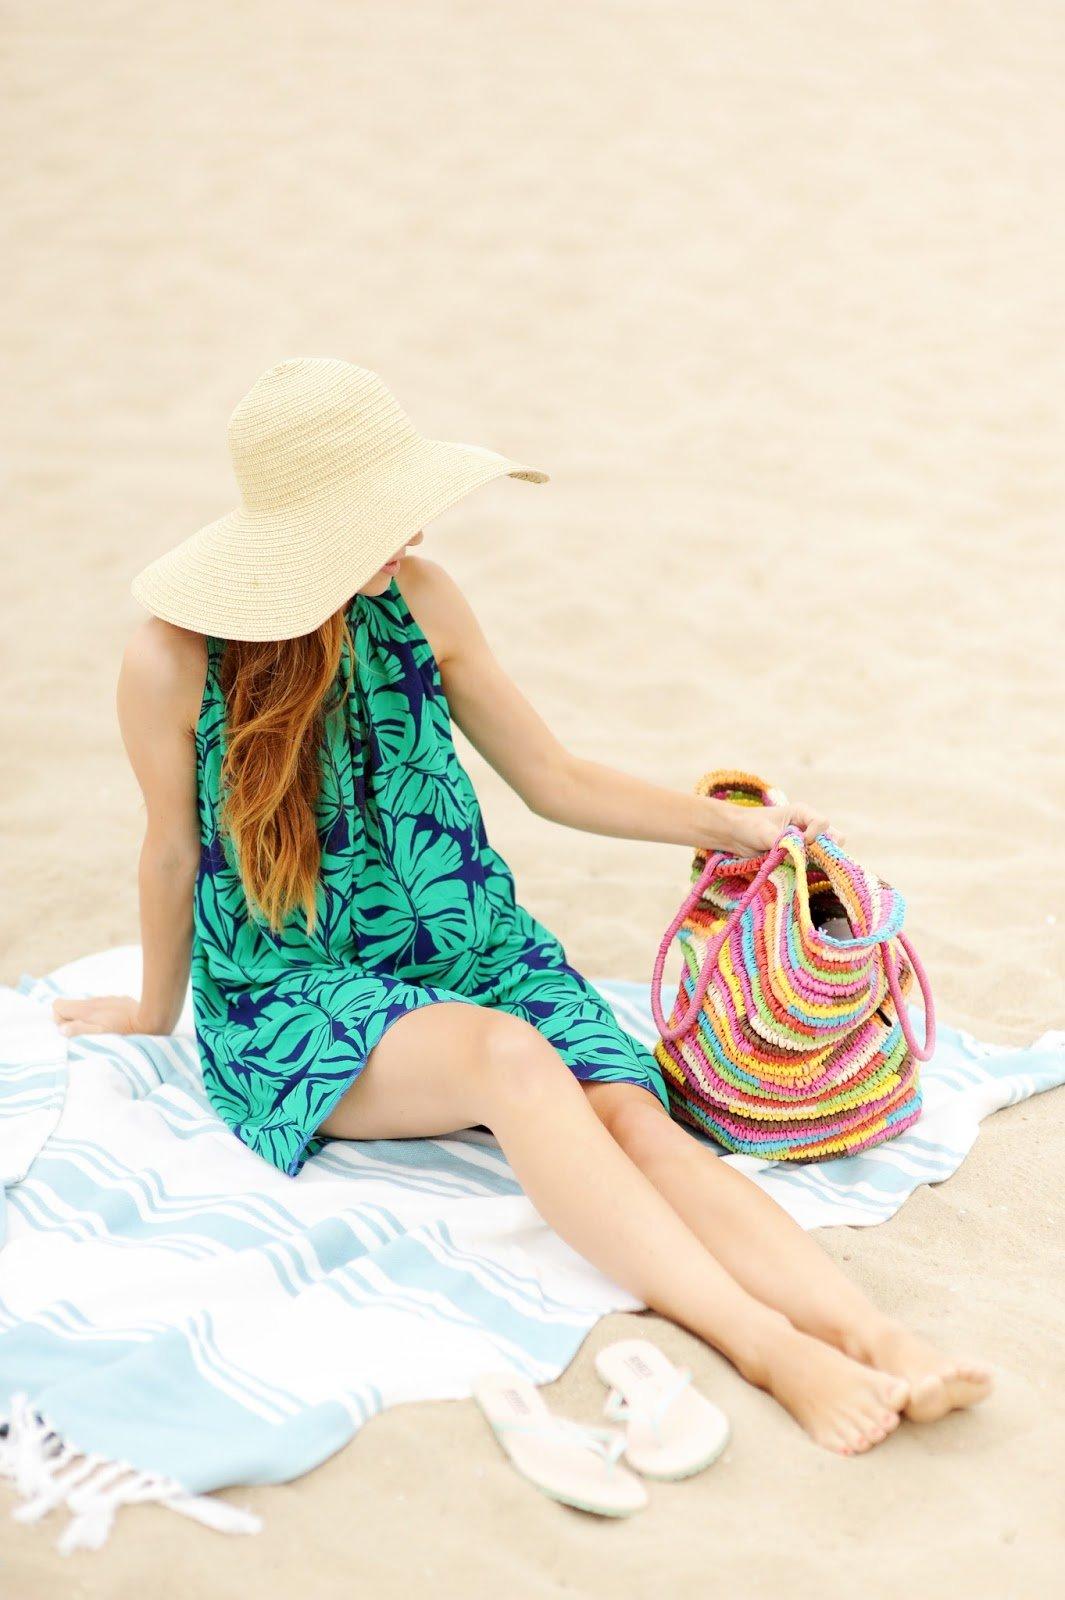 DIY FRIDAY: PLEATED PALM LEAF PRINT BEACH DRESS (SEWING TUTORIAL) | Merrick's Art